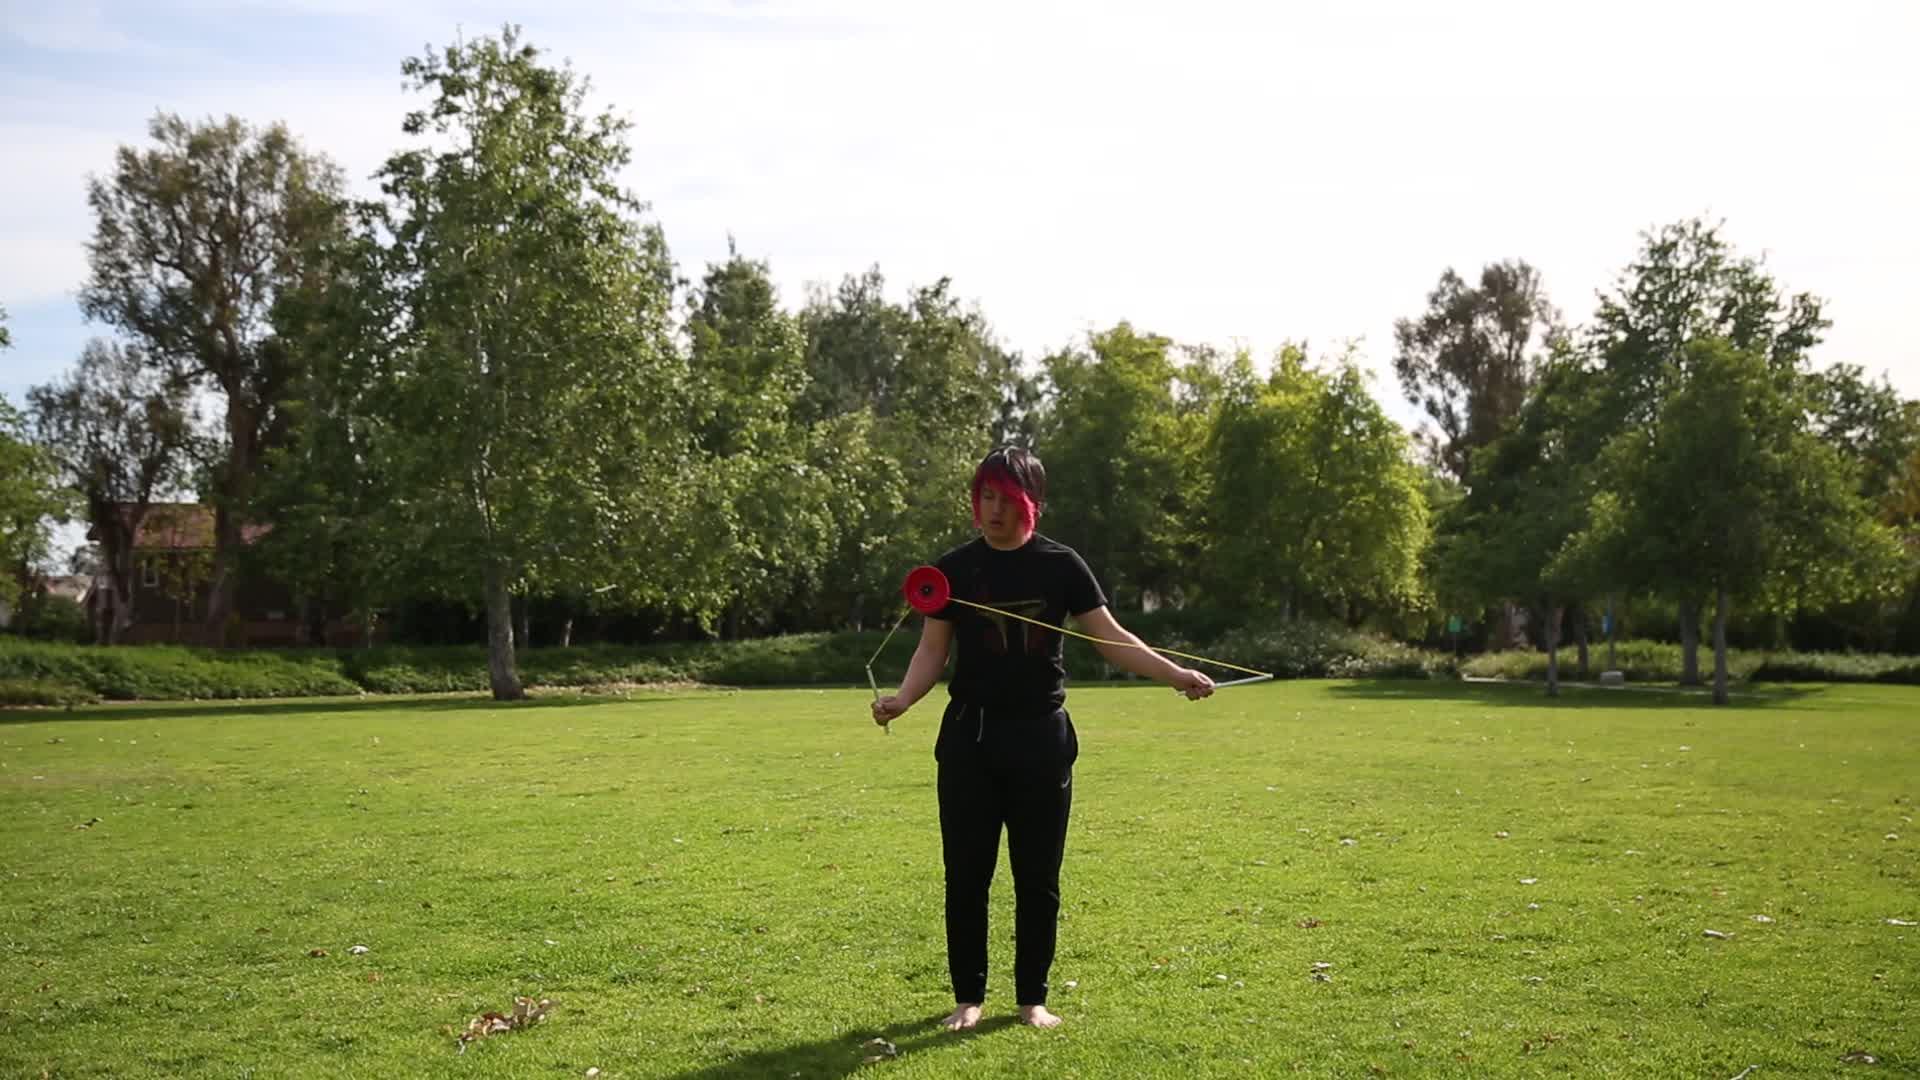 juggling,  GIFs